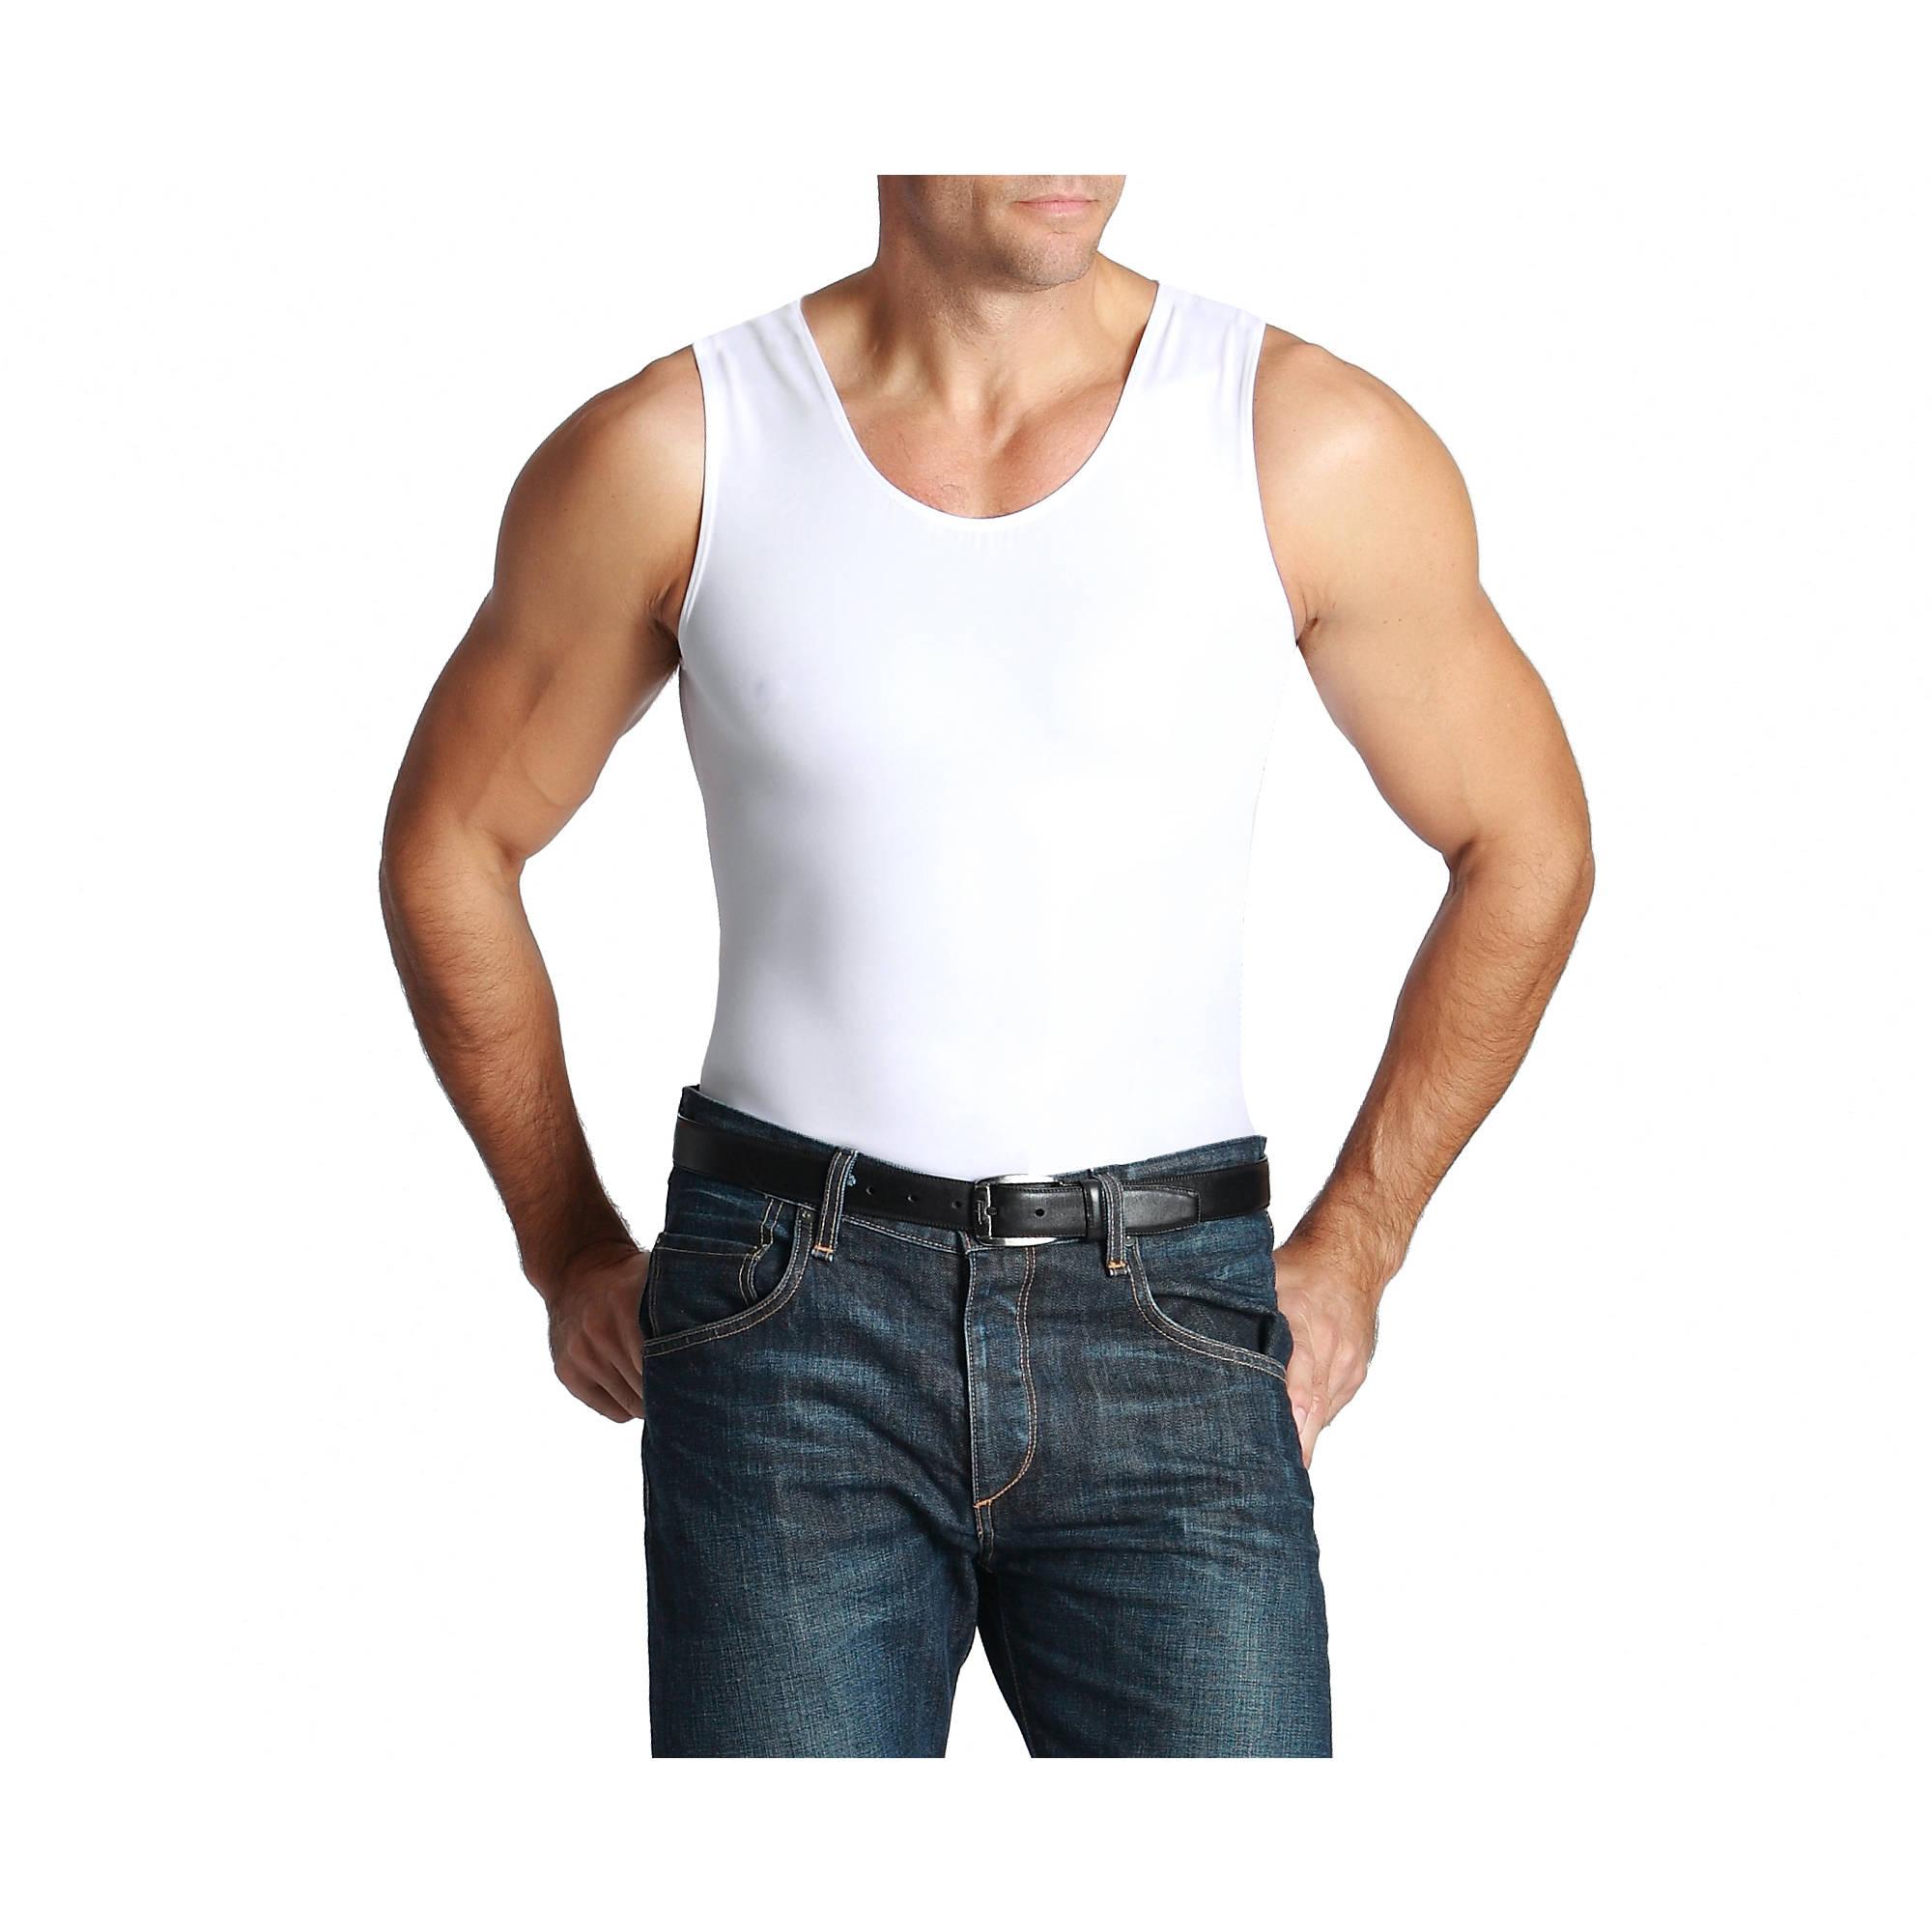 As Seen On TV Insta-Slim Tank, White, Large